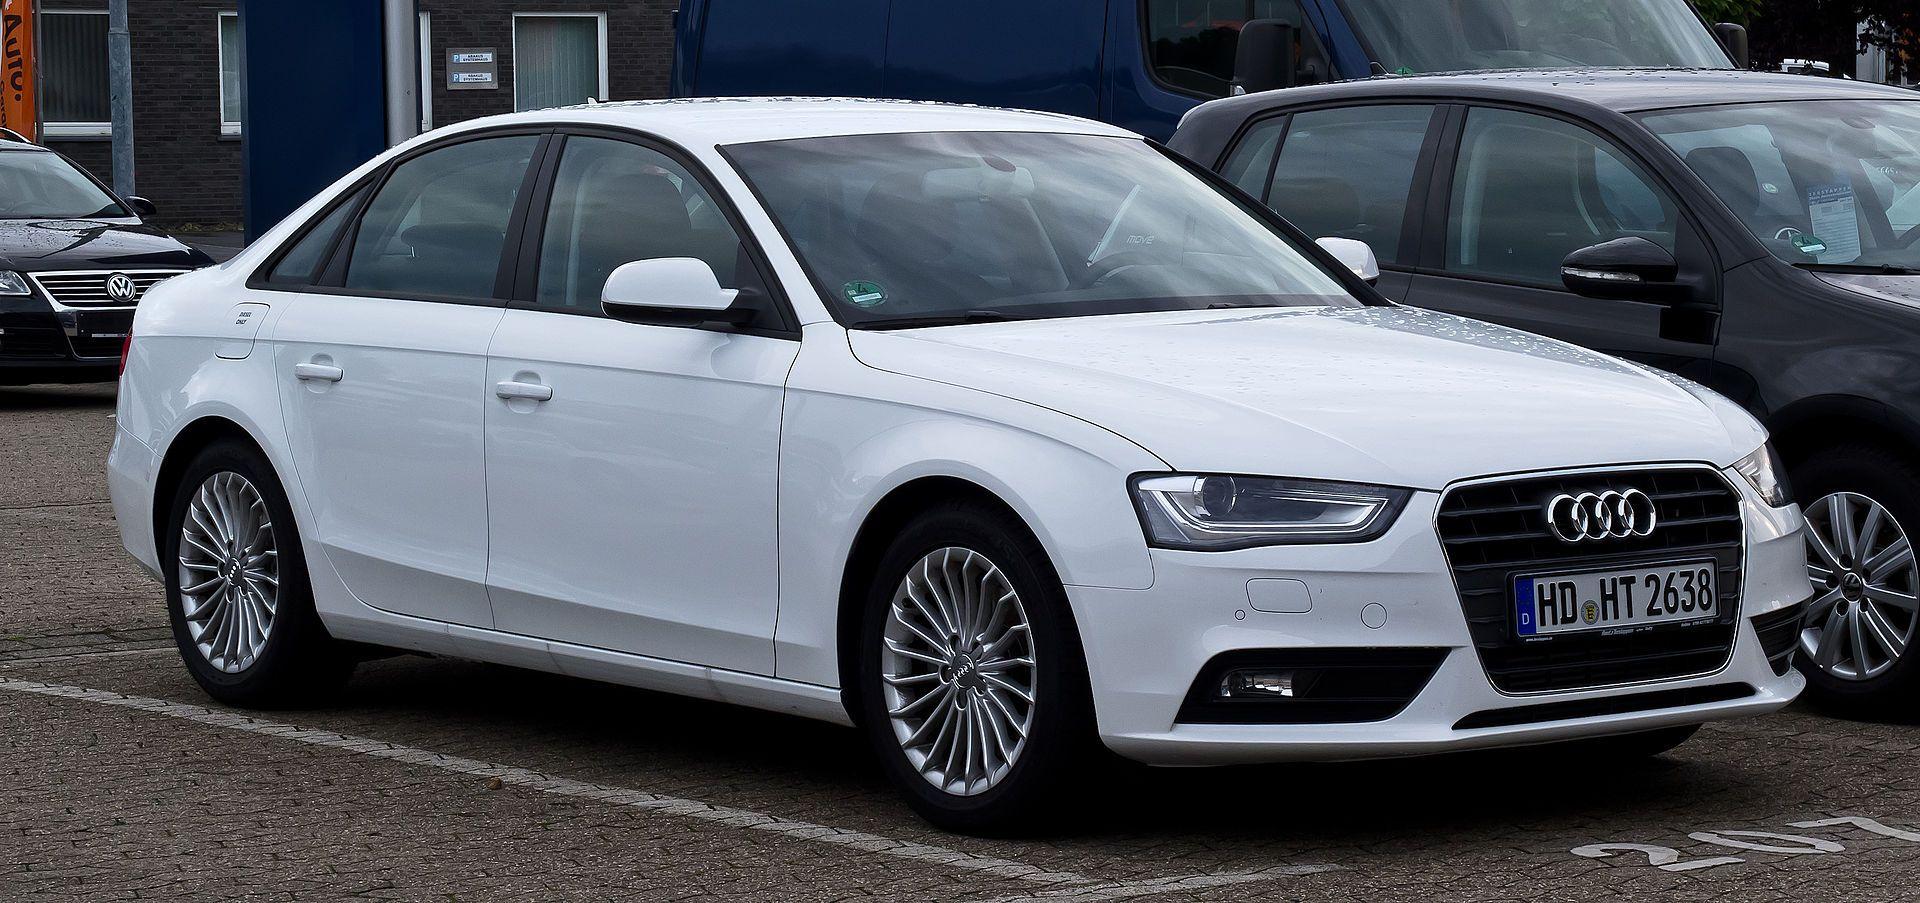 Kekurangan Audi A4 2.0 Tdi Tangguh